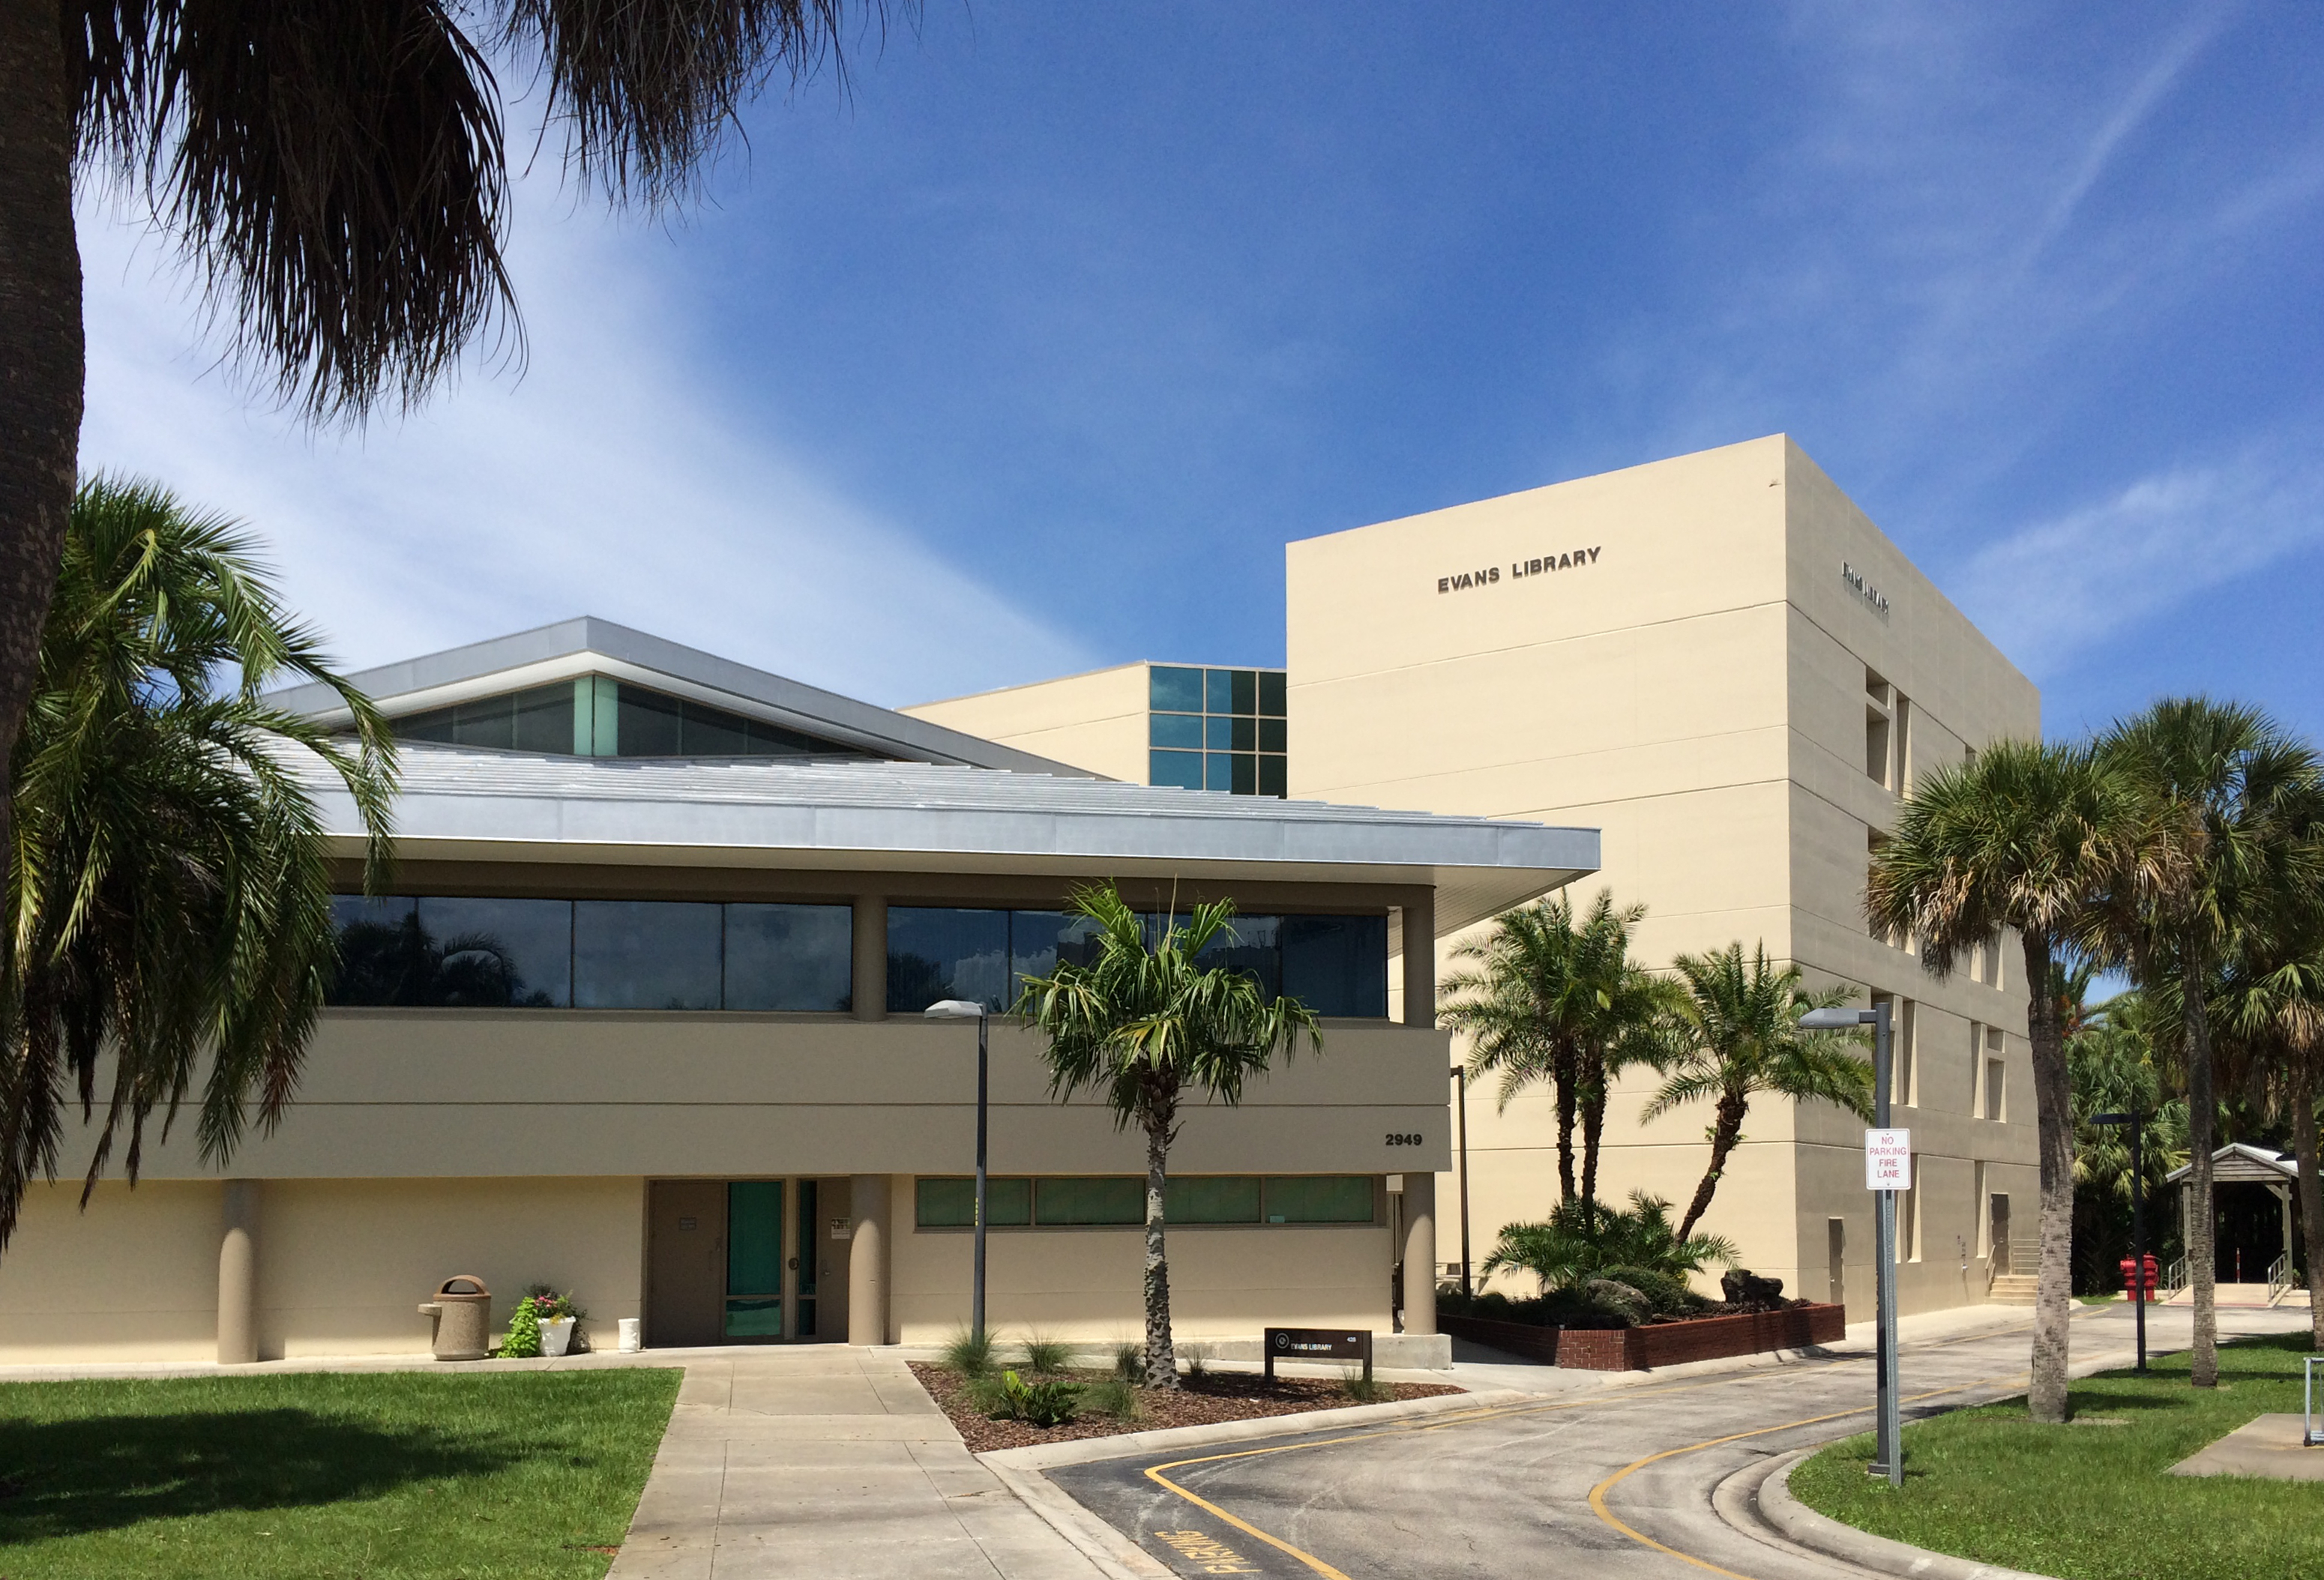 Evans Library at Florida Tech